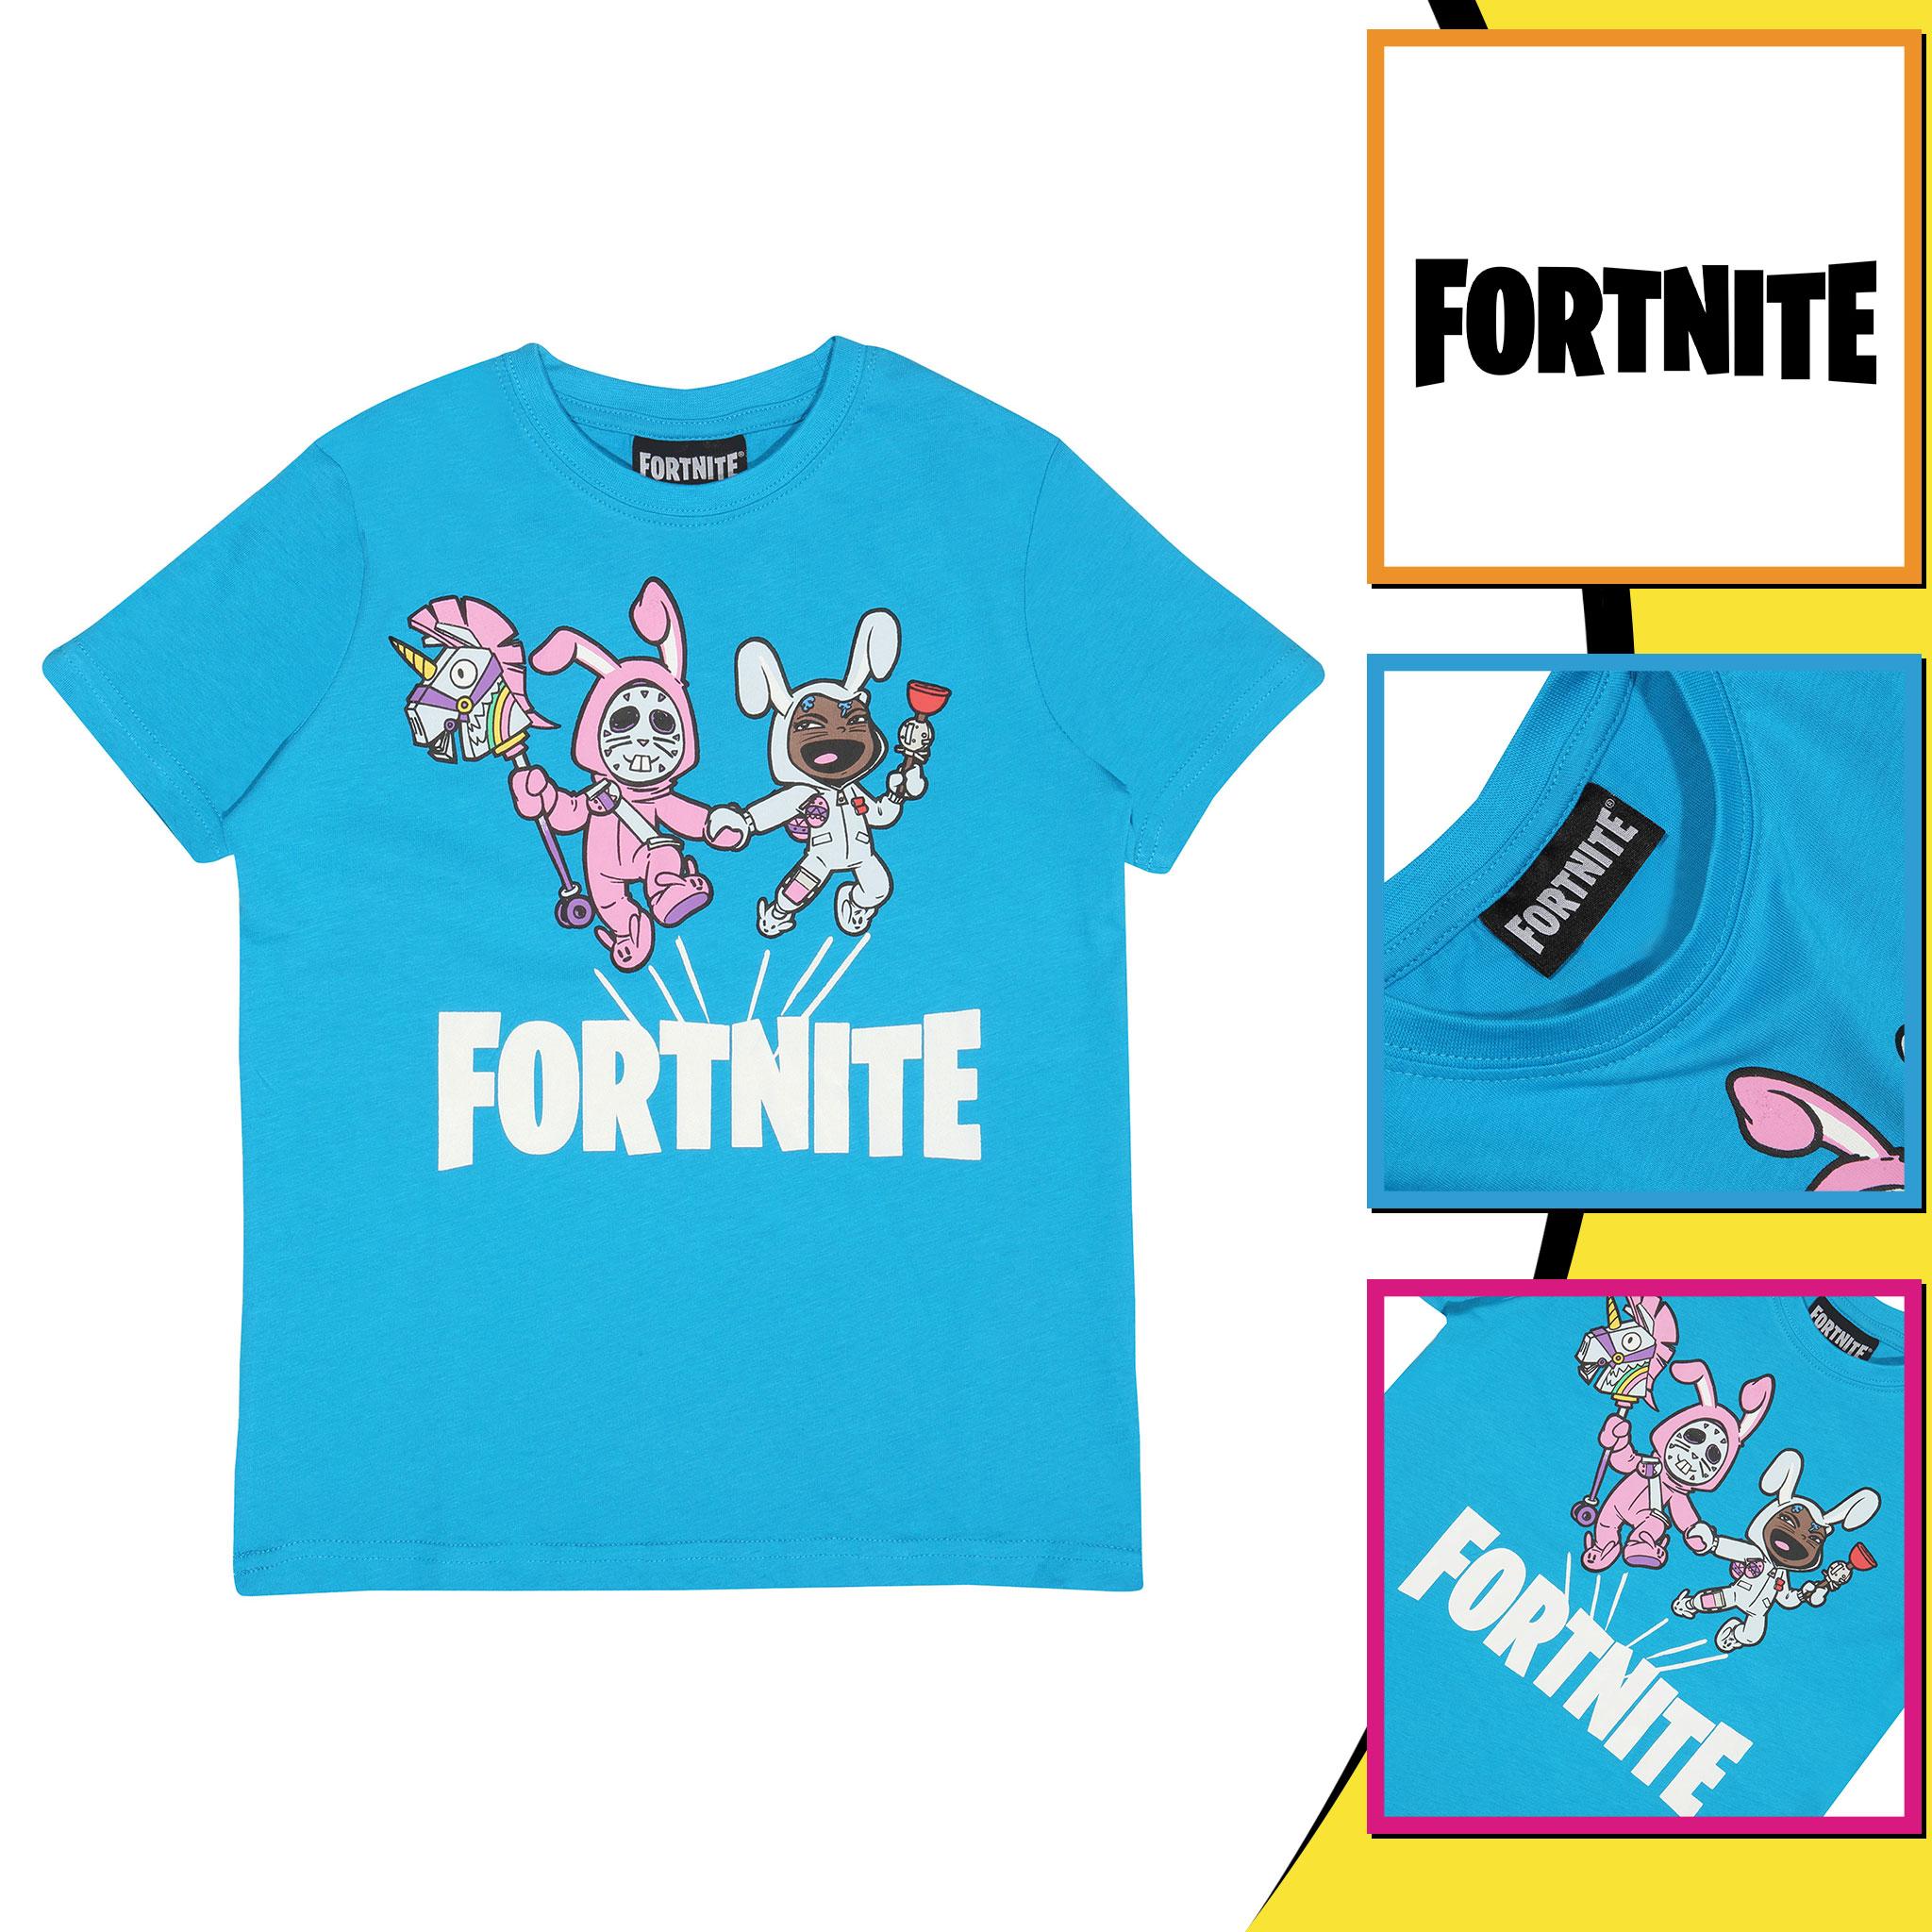 miniature 7 - Boys Fortnite T Shirt Bunny Trouble Official Merchandise